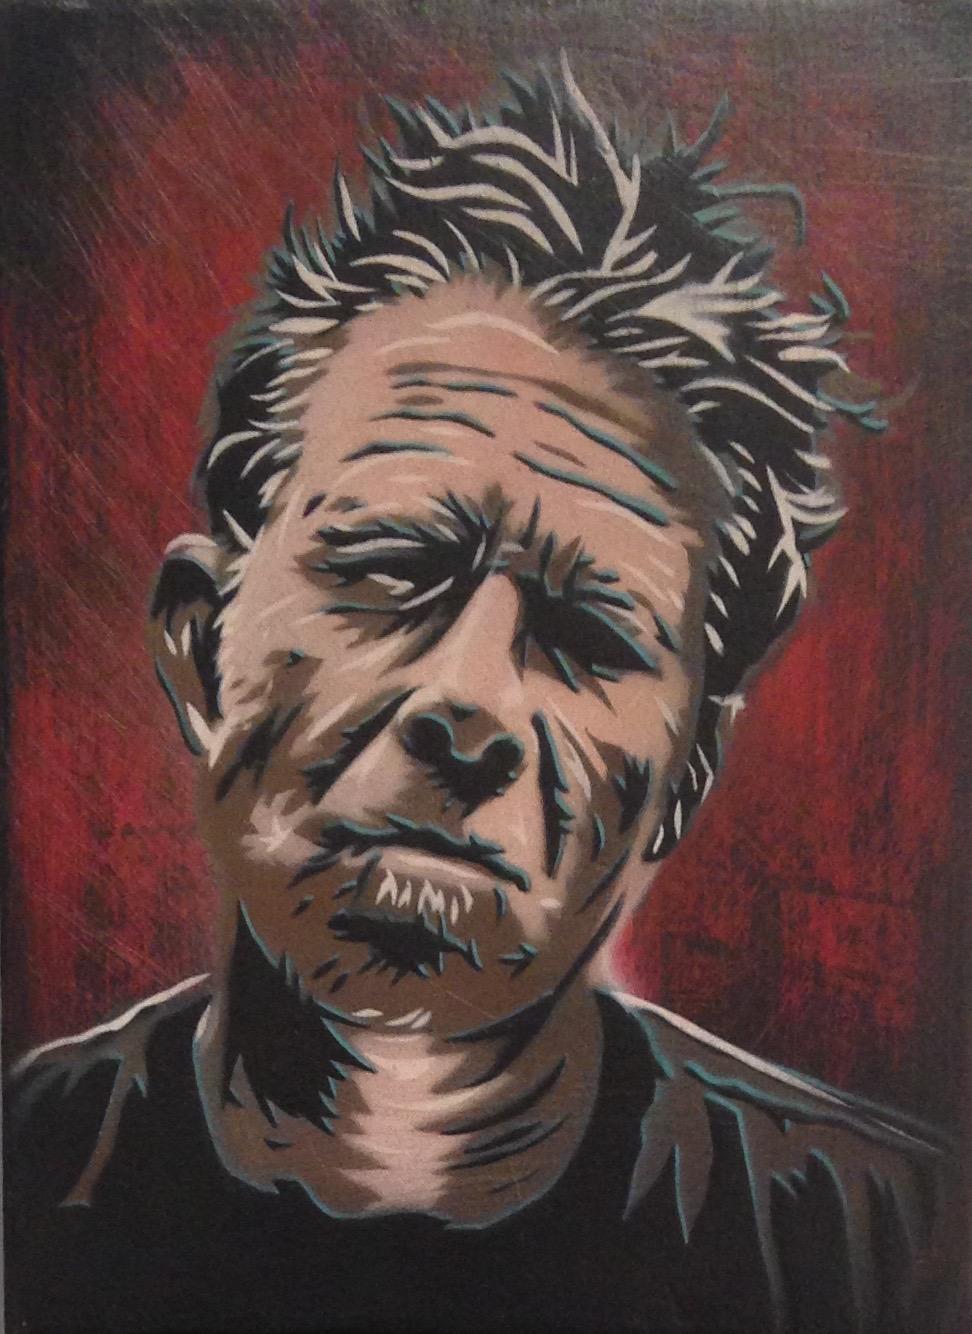 """Tom Waits"" 9""x12"" stencil, aerosol, latex paint on wood panel $250"